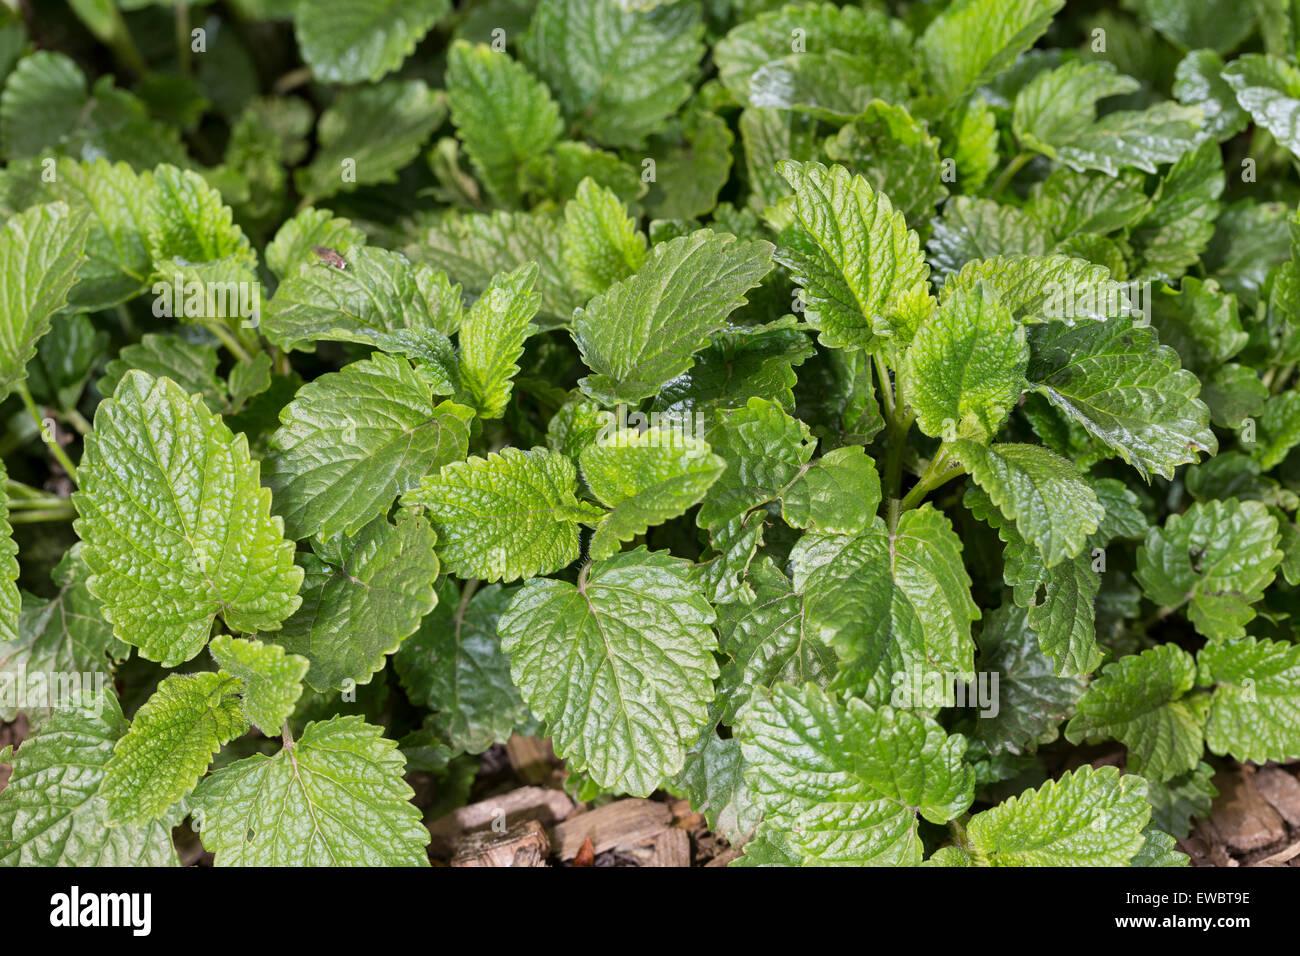 Bee Balm, Lemon Balm, leaf, leaves, Zitronenmelisse, Zitronen-Melisse, Blatt, Blätter, Melisse, Melissa officinalis, Stock Photo